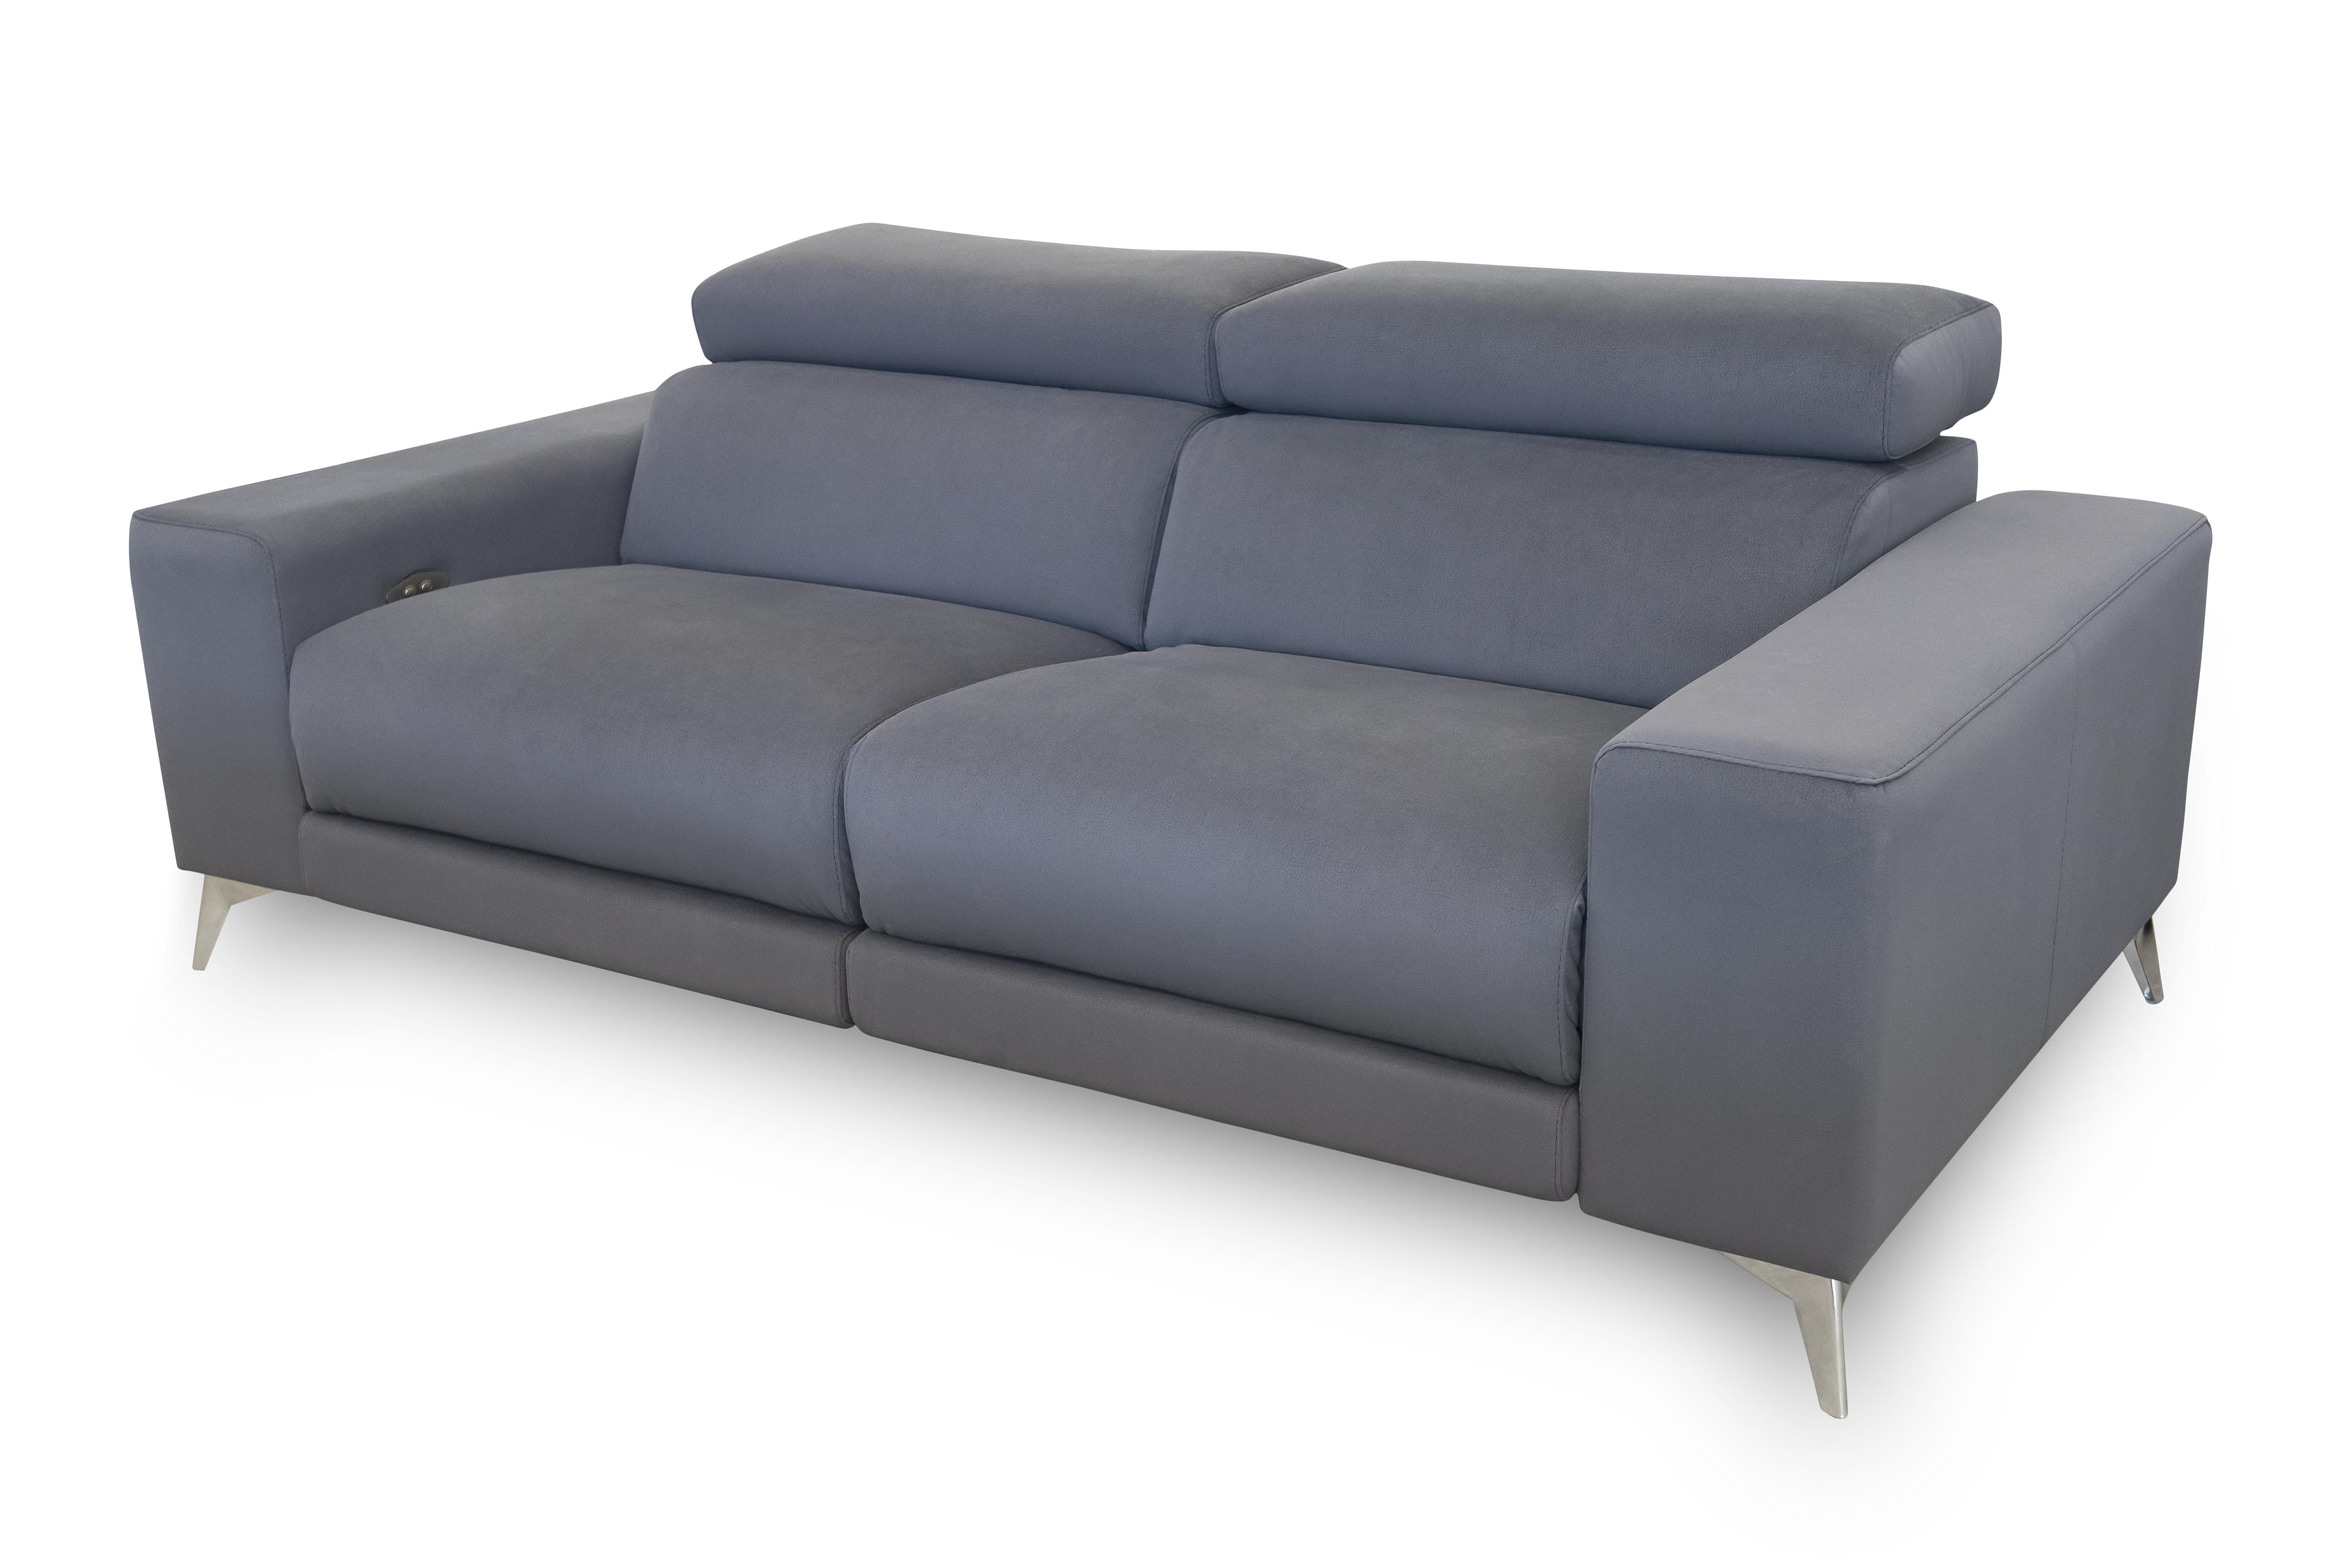 sofa-modelo-abril-2-relax-electricos-850e